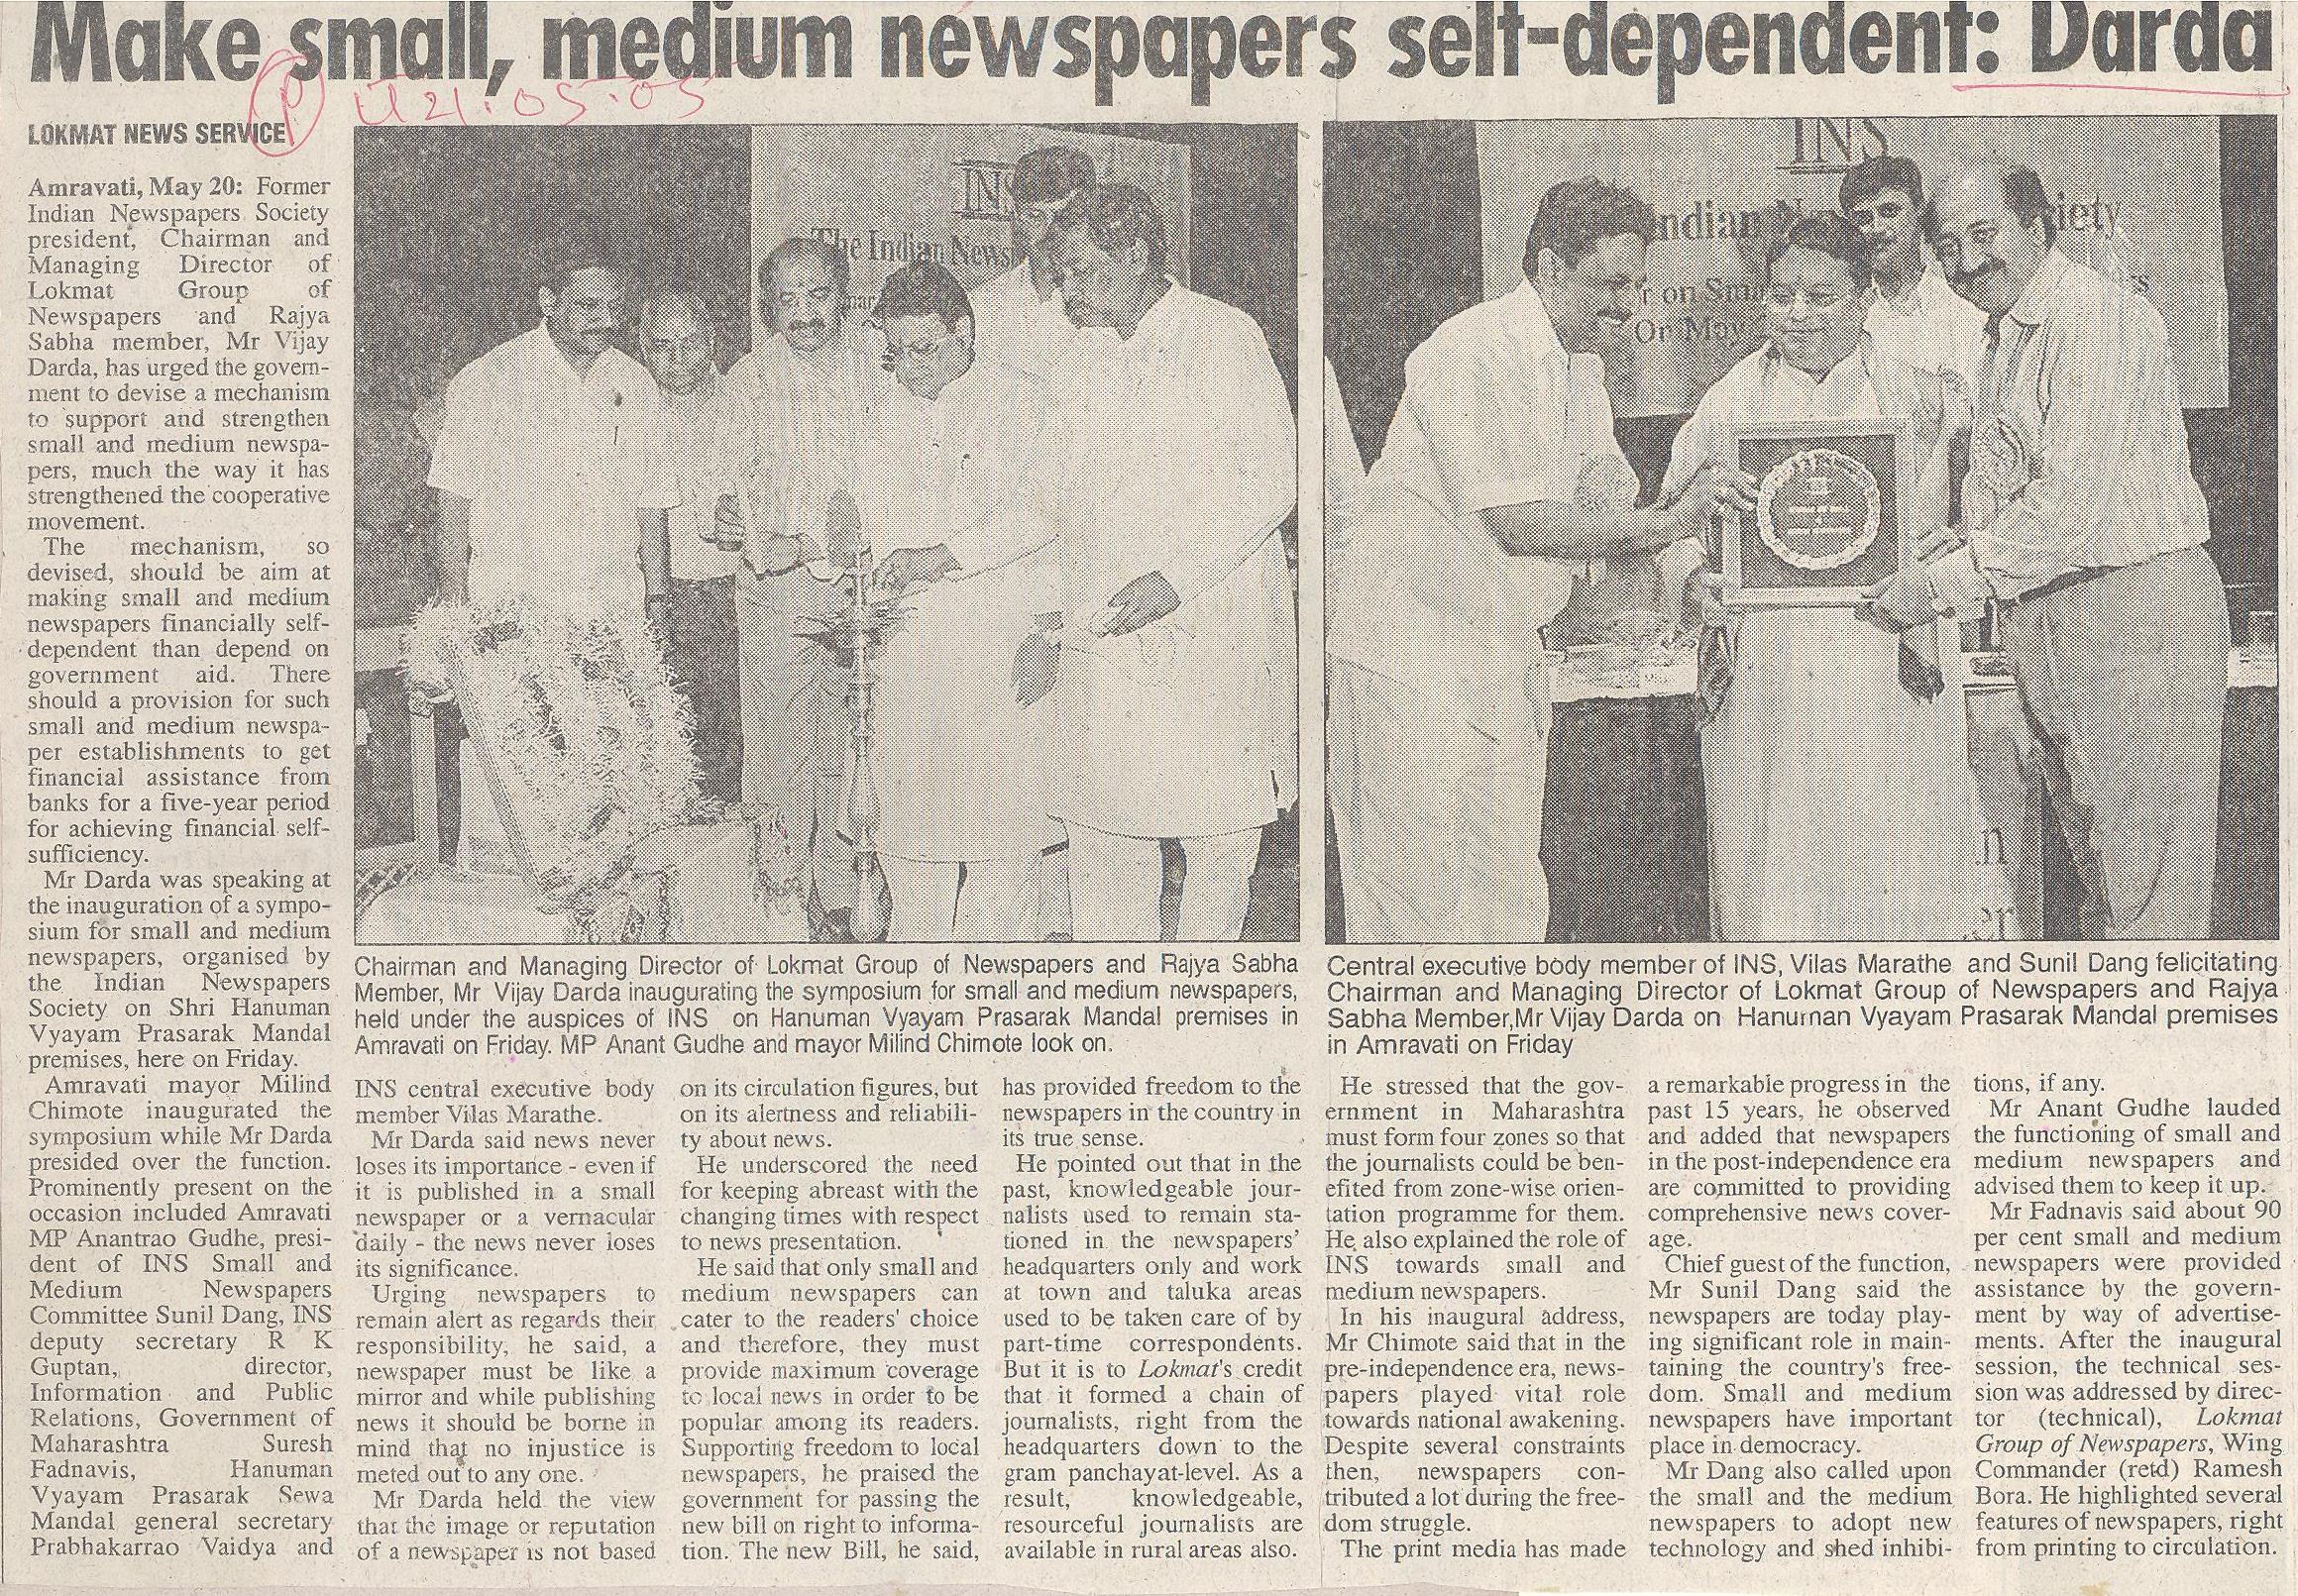 Make small, medium newspapers self-dependent: Darda